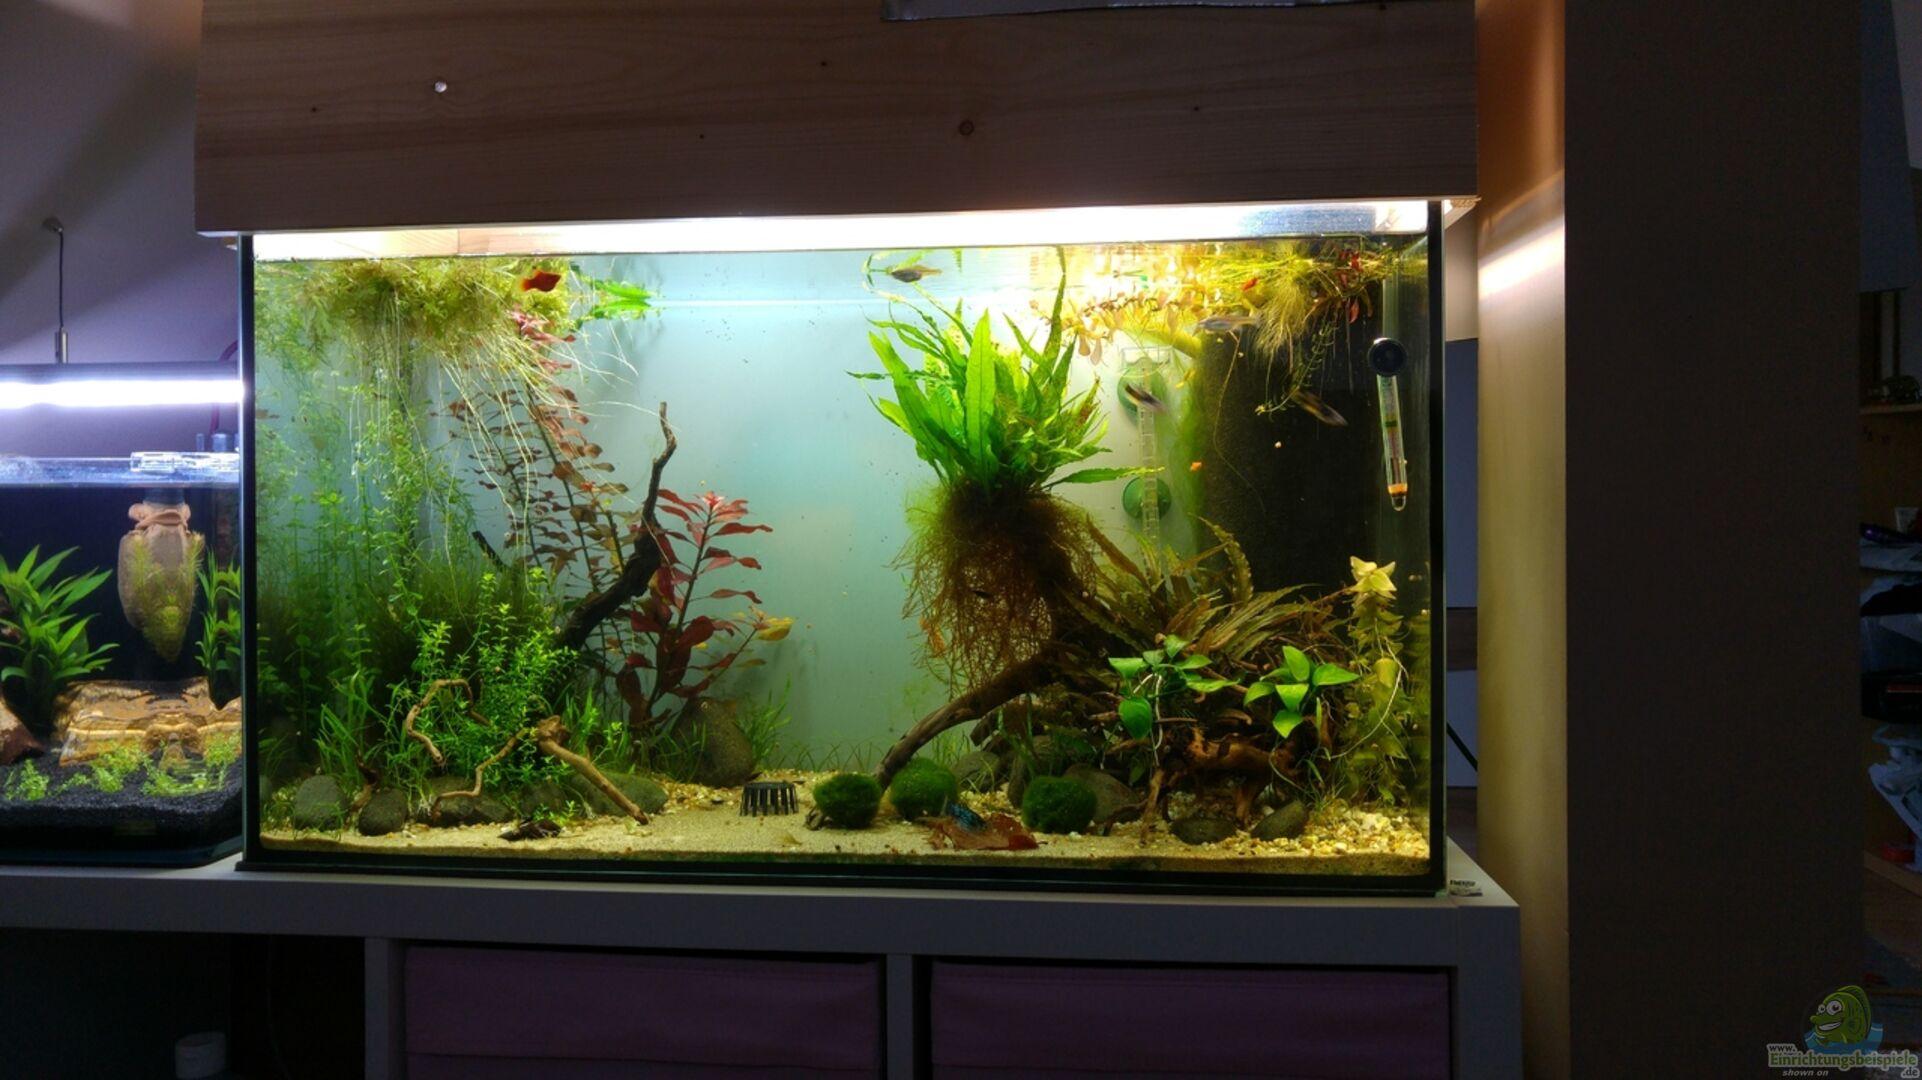 Ikea Kallax Aquarium Stand Kallax Von Ikea Als Aquarium